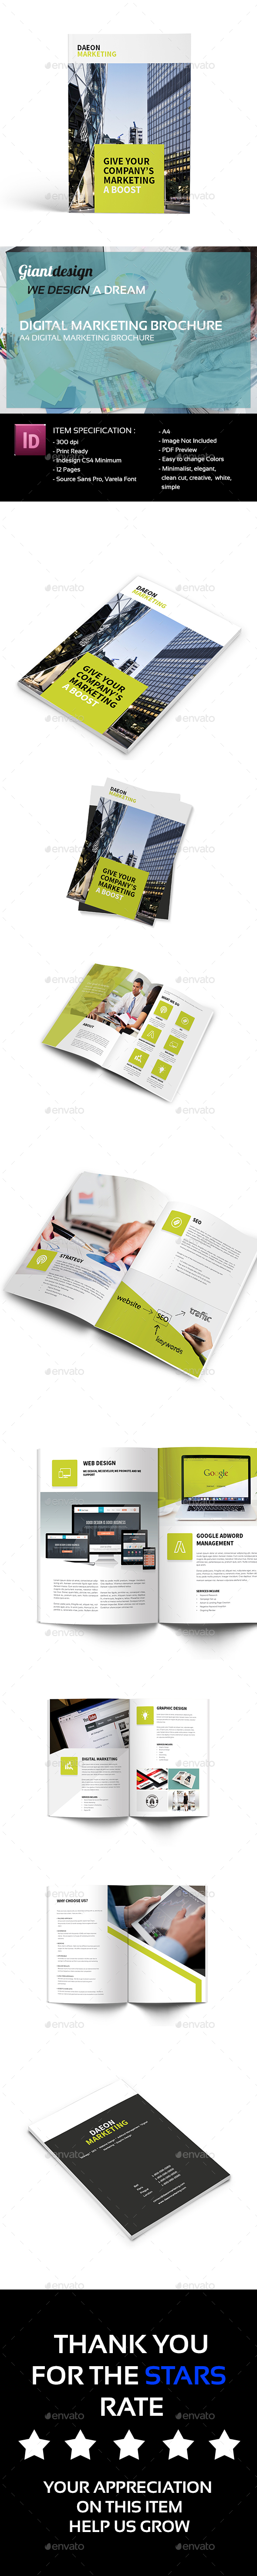 Digital Marketing Brochure - Corporate Brochures